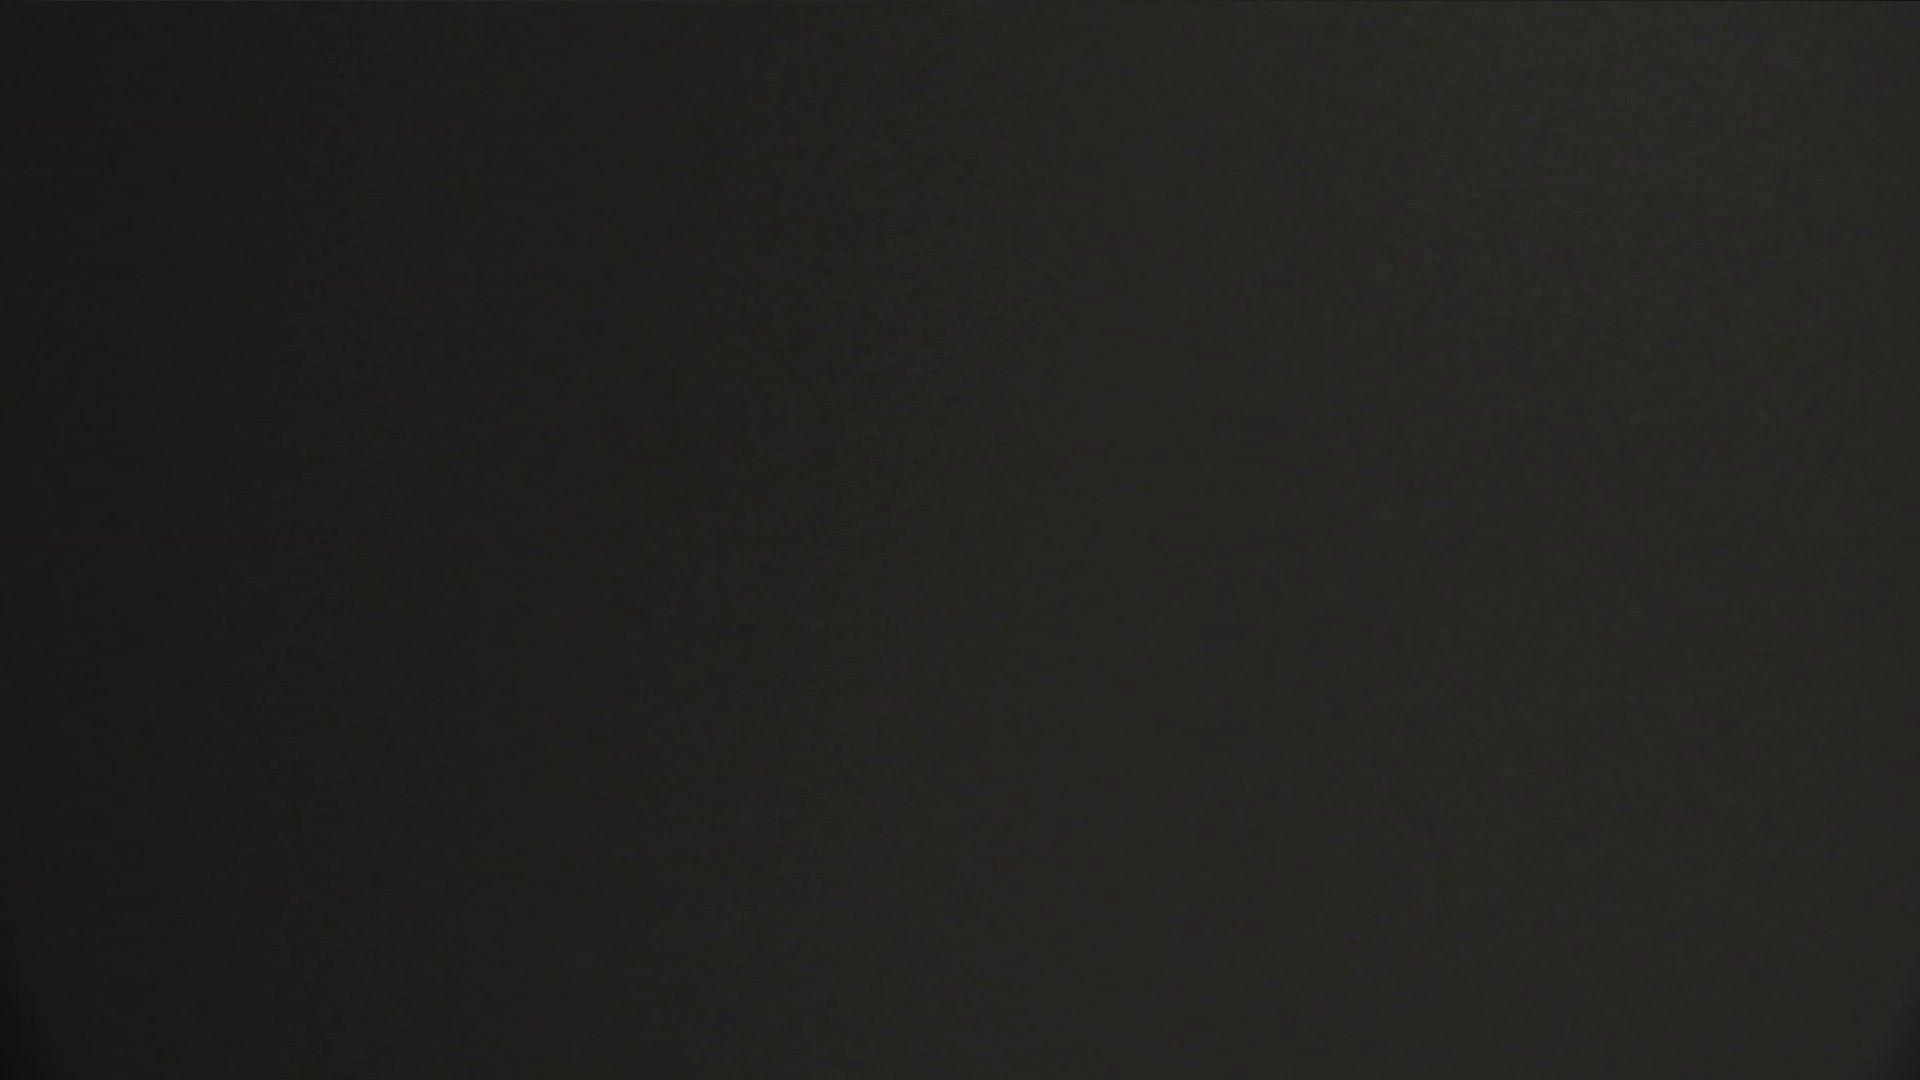 vol.08 命がけ潜伏洗面所! 黒ストッキングが流行りです。 プライベート 女性器鑑賞 64画像 7